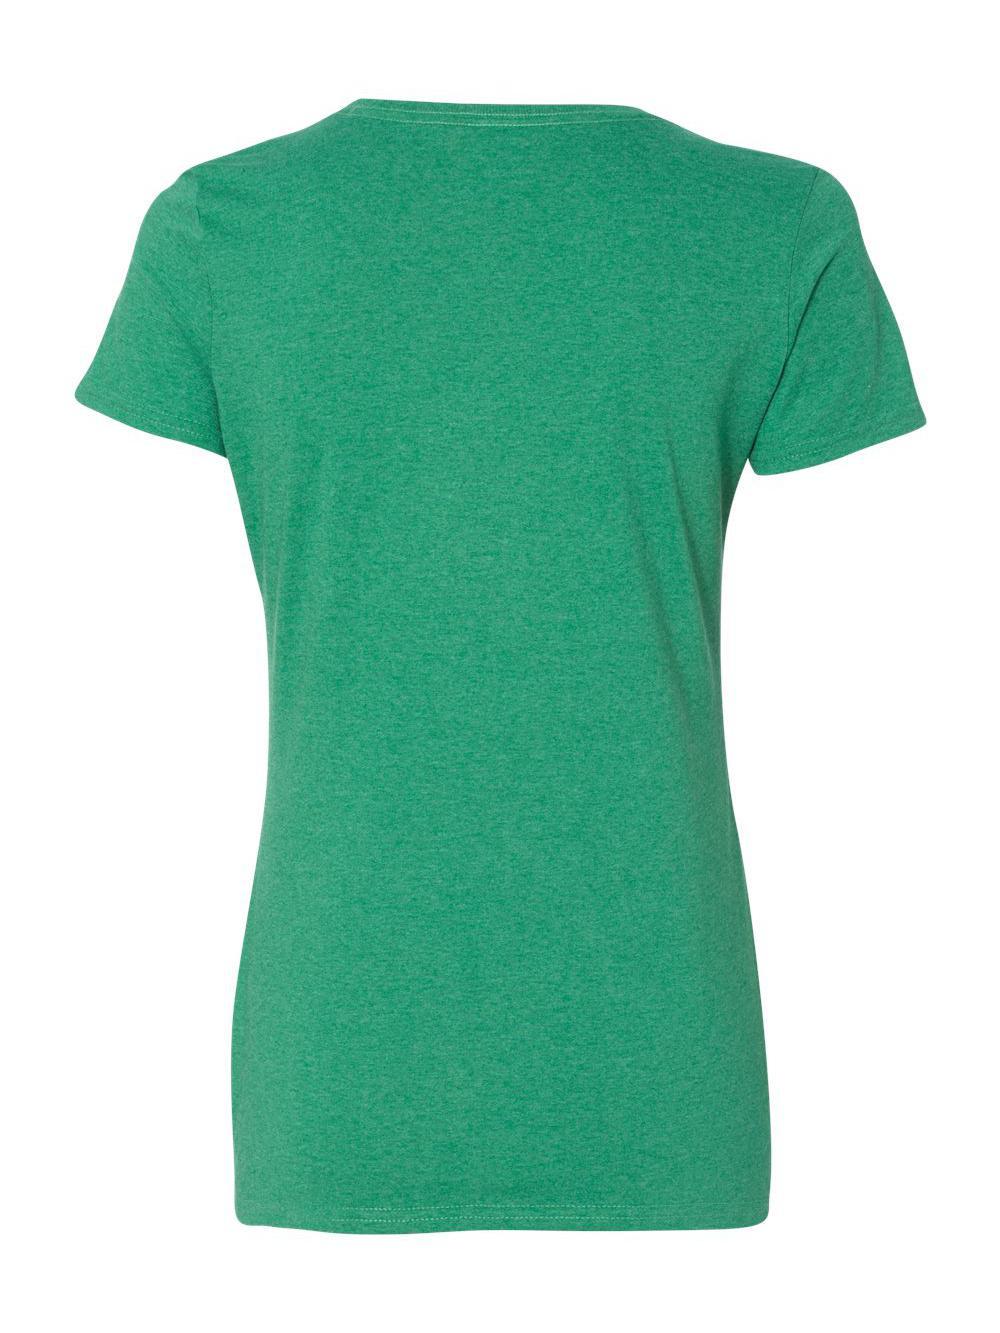 Fruit-of-the-Loom-HD-Cotton-Women-039-s-Short-Sleeve-T-Shirt-L3930R thumbnail 28